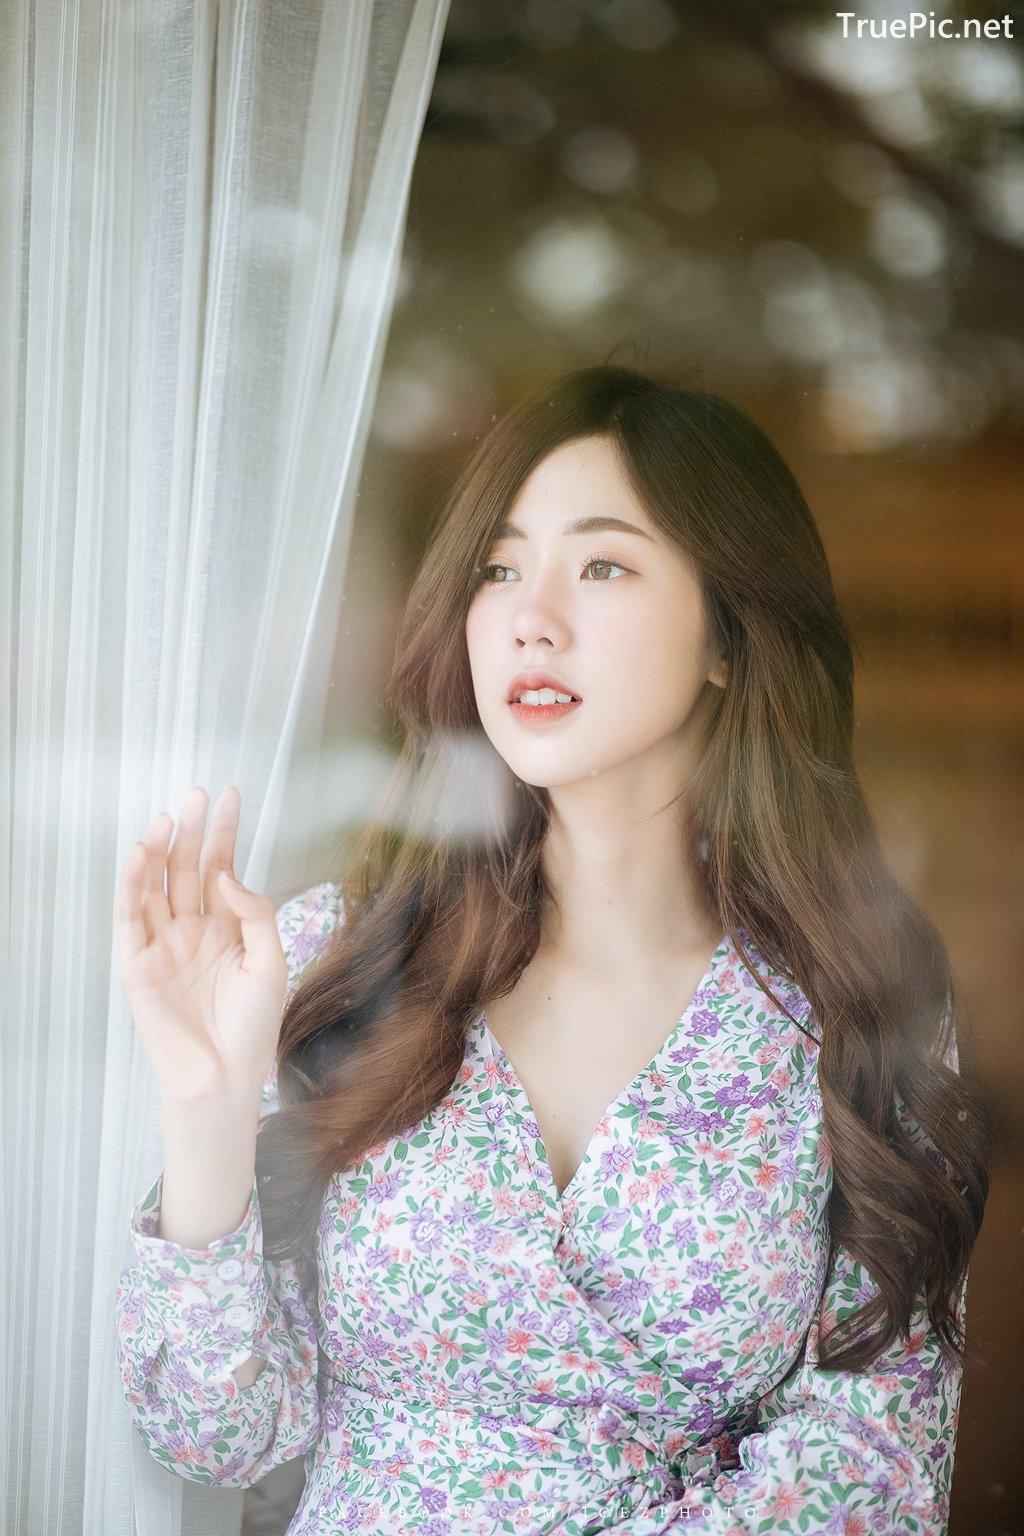 Image-Thailand-Hot-Girl-Nilawan-Iamchuasawad-Pure-Beauty-Early-Morning-TruePic.net- Picture-1